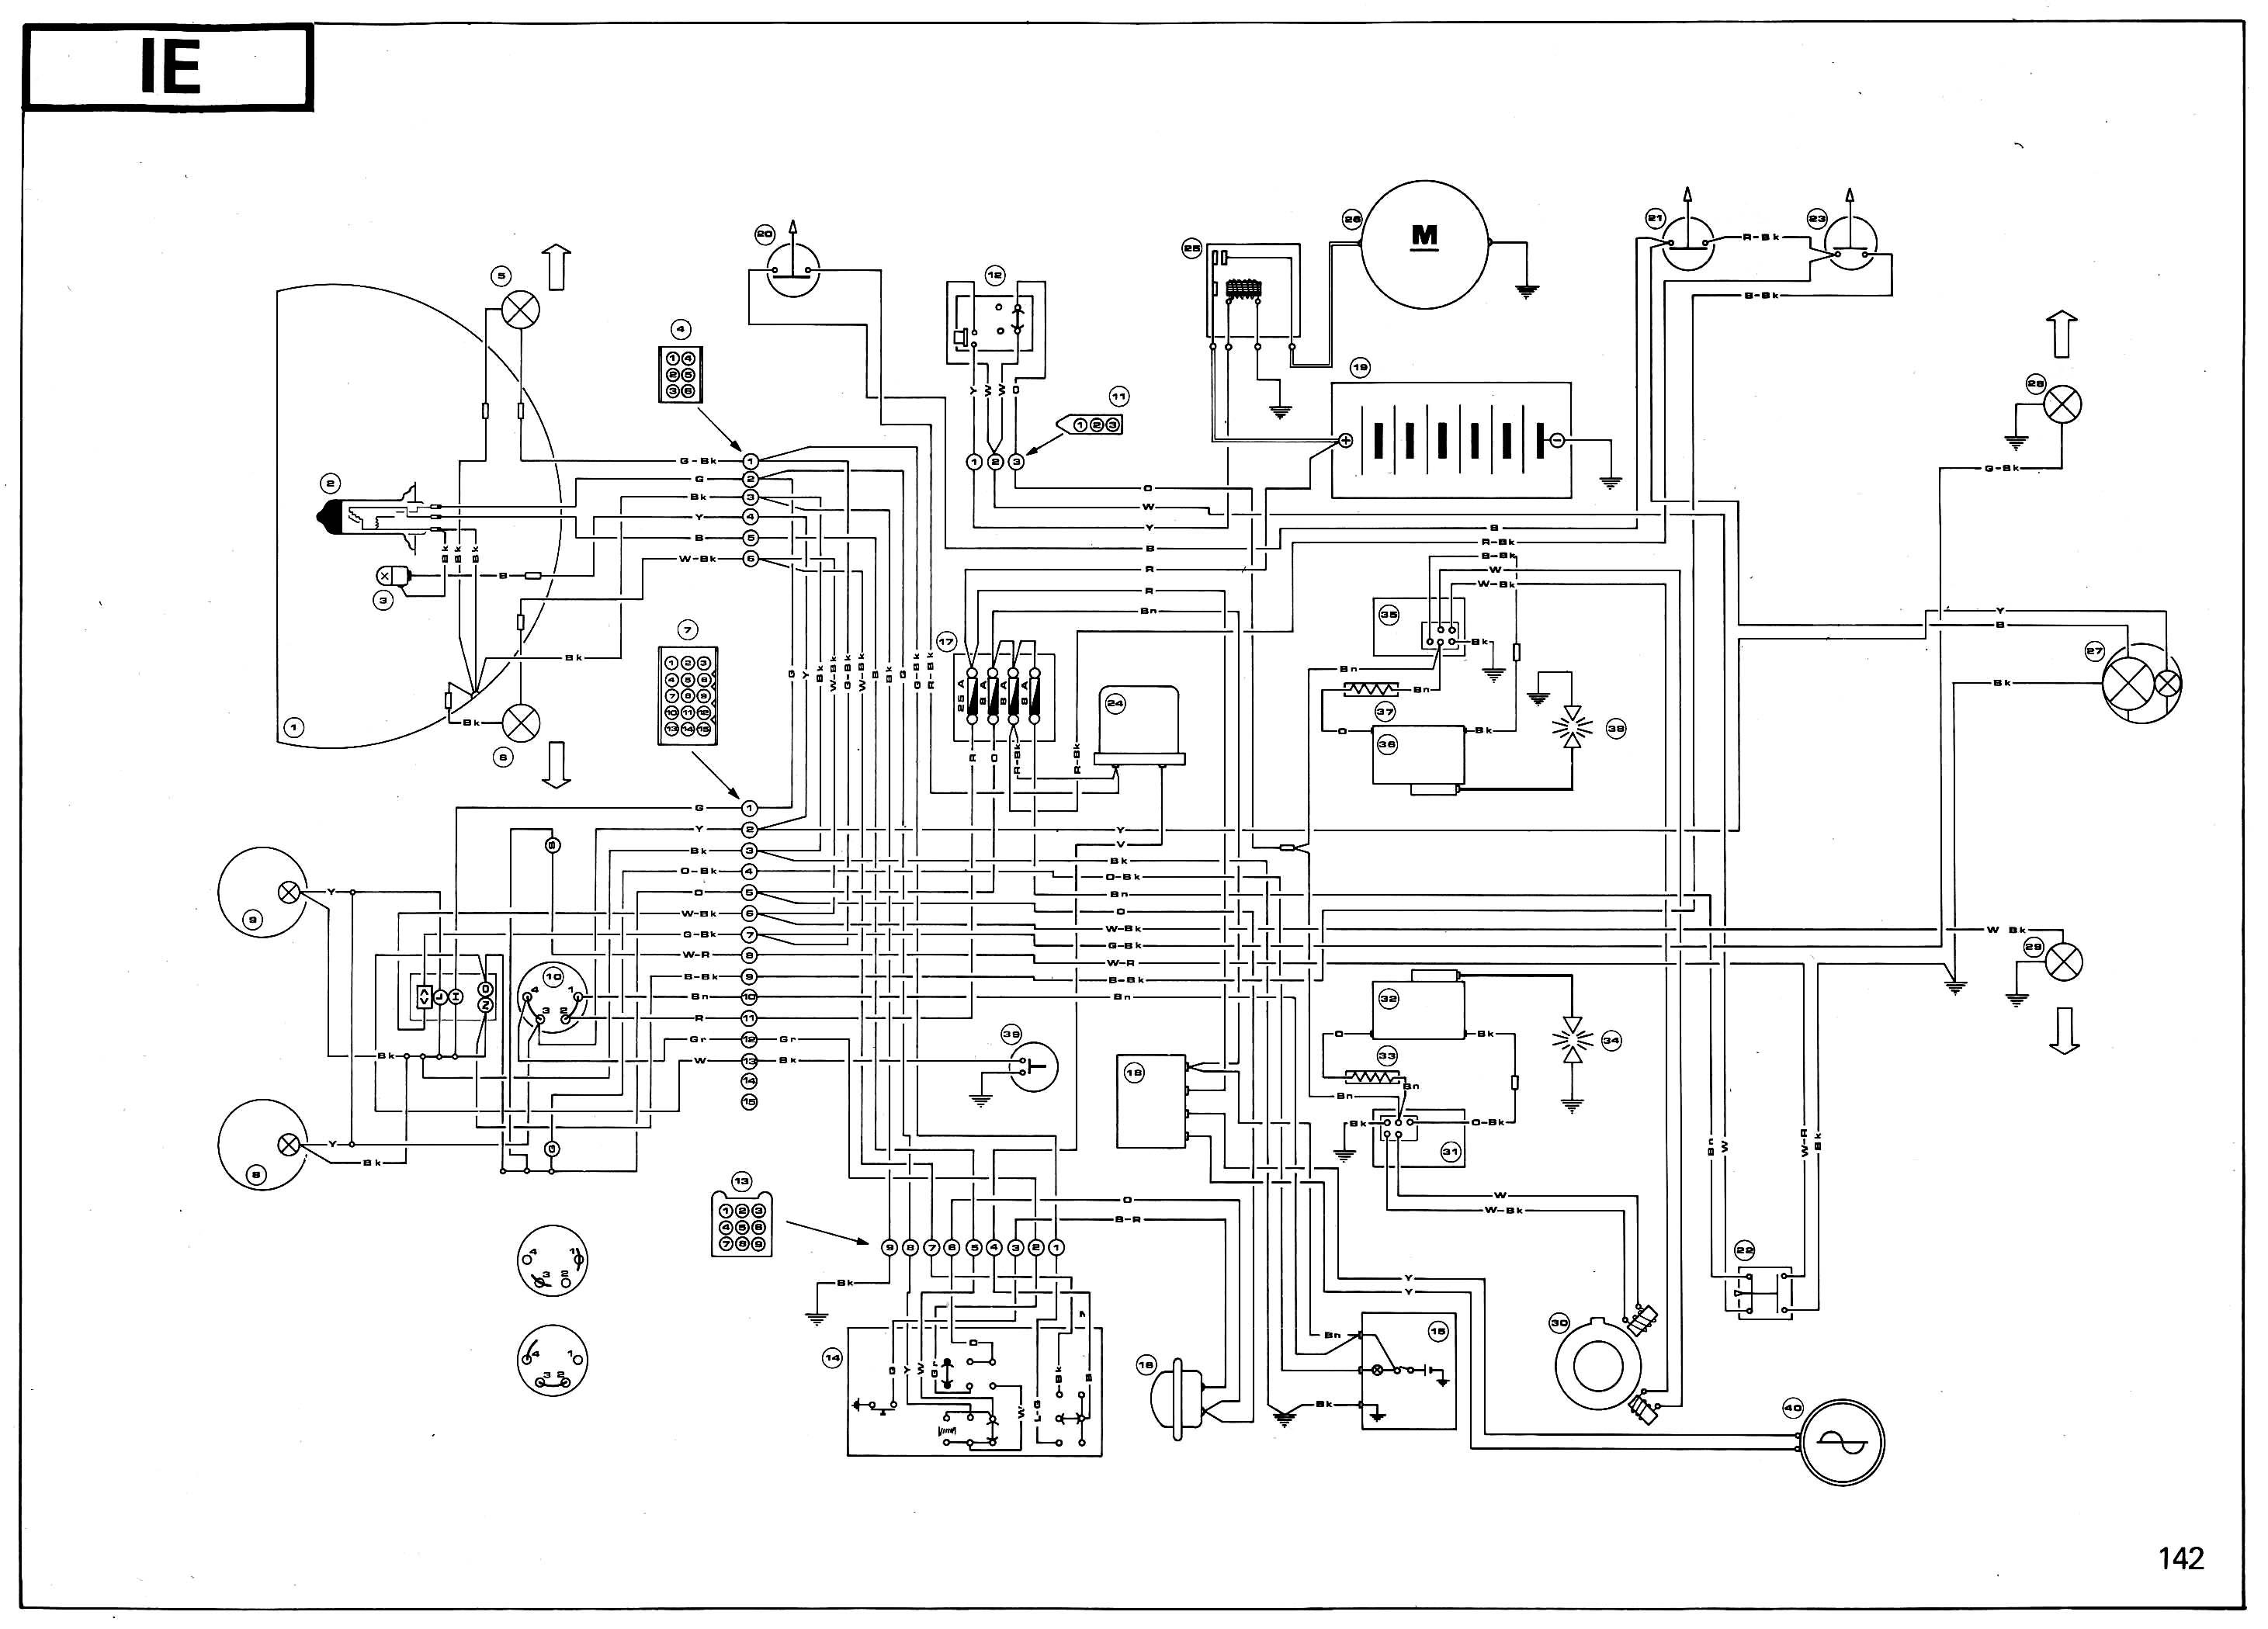 ducati 999 tail light wiring diagram